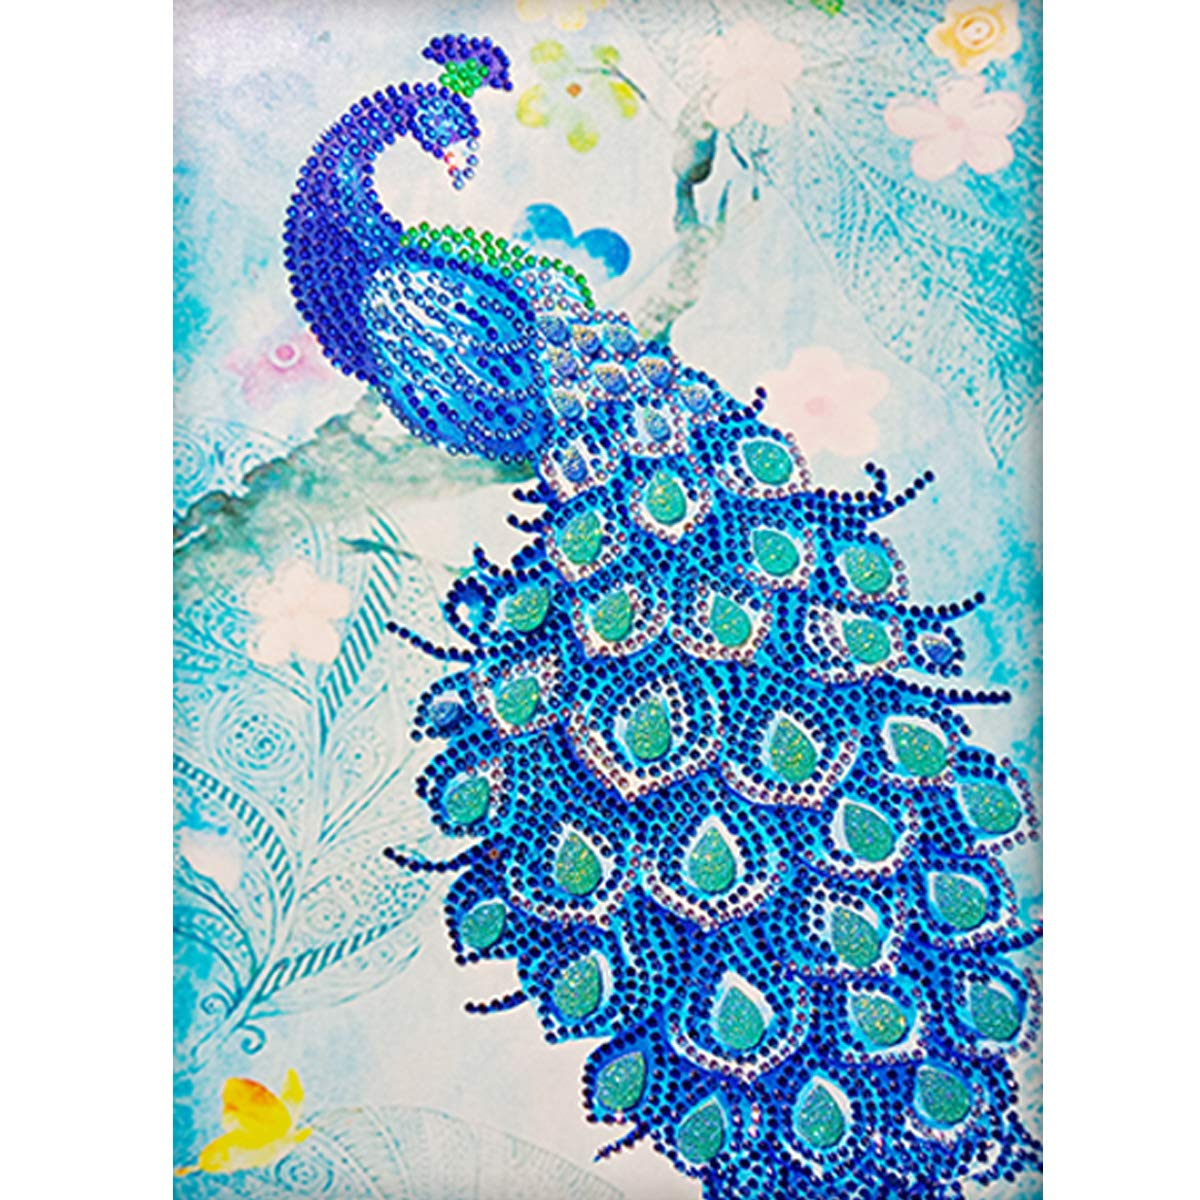 Full Round Drill 5D Diamond Painting Crafts Stitch Home DIY Xmas Christmas Wall